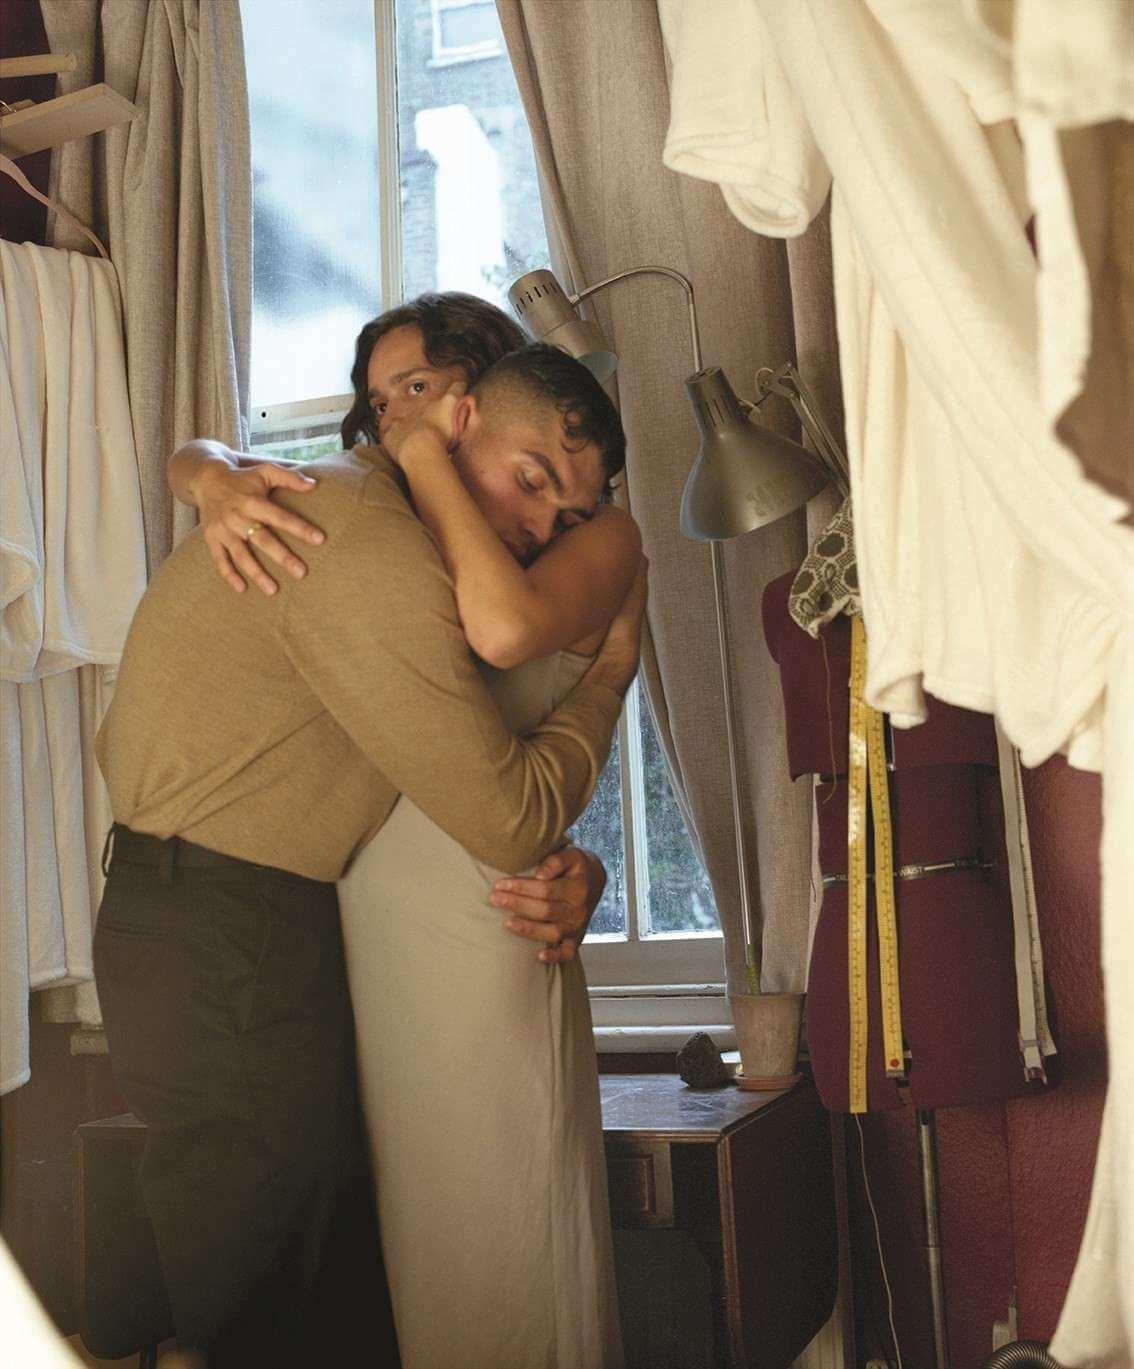 Queer Gaze from Poland: A Portrait of Love and Desire. Fotografía: Natalia Podgórska